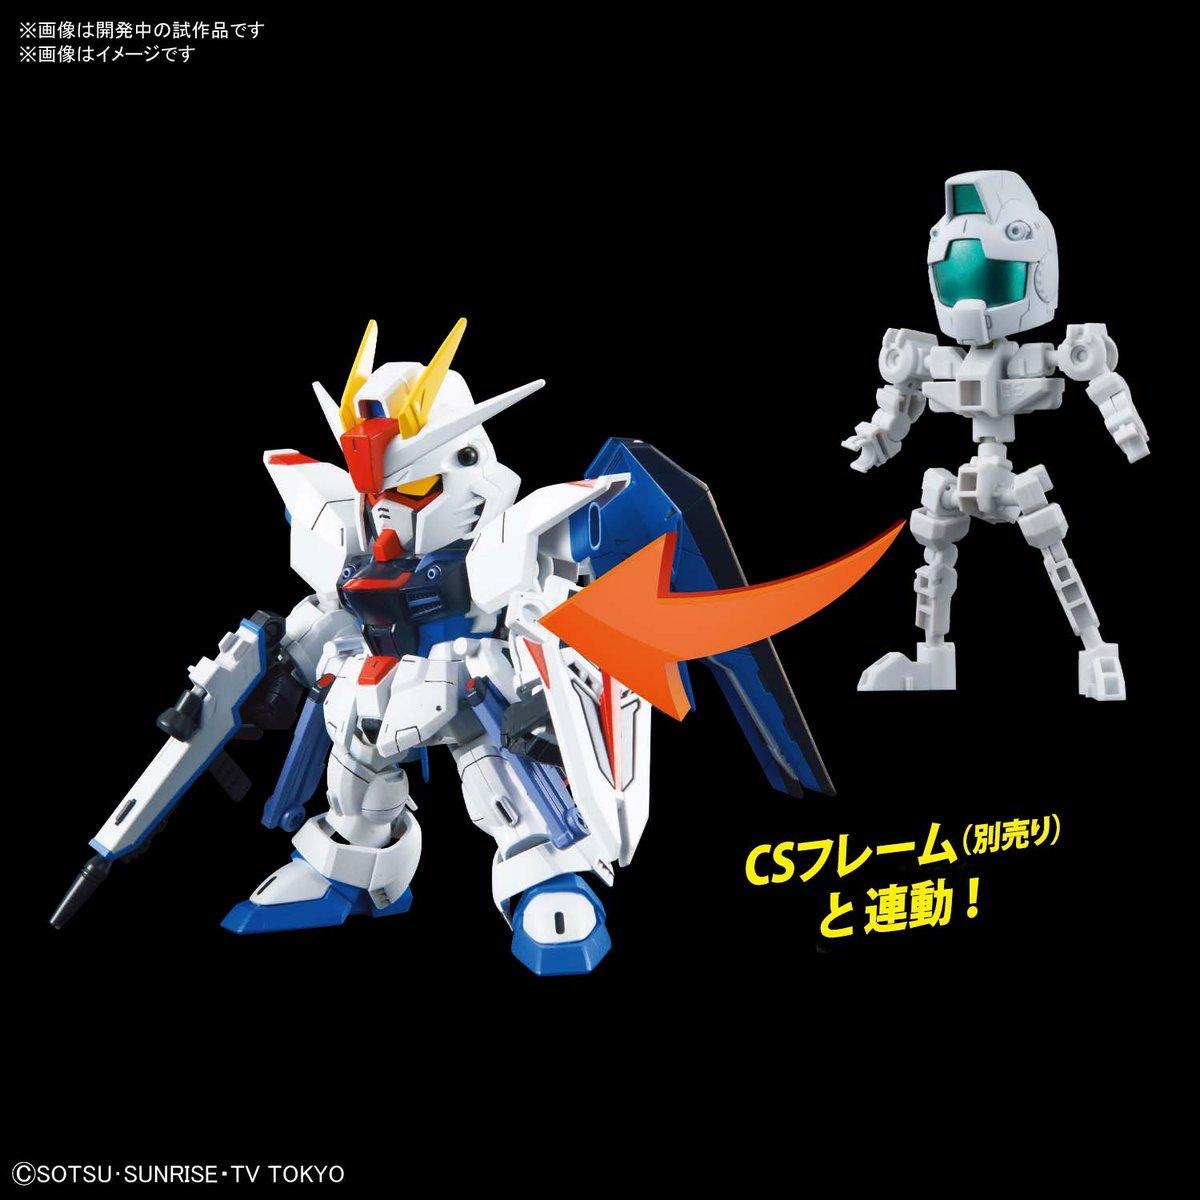 SDCS ZGMF-X10A Freedom Gundam (7)